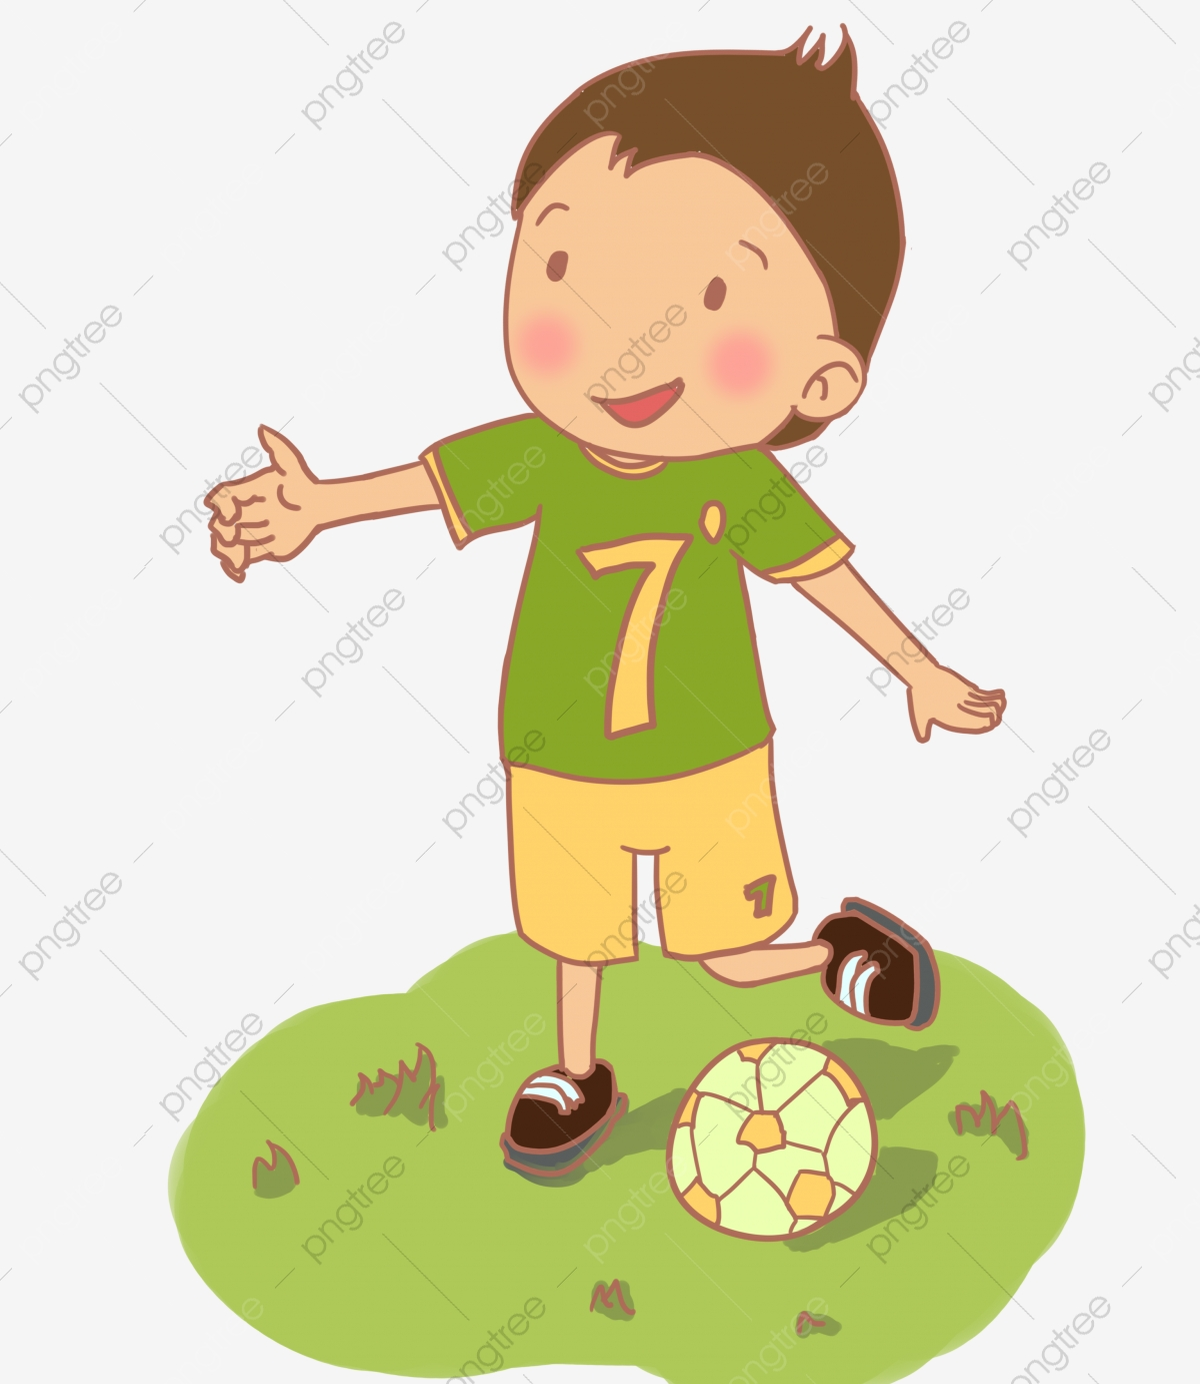 Der Junge Fussball Spielen Junge Suss Schuler Charakter